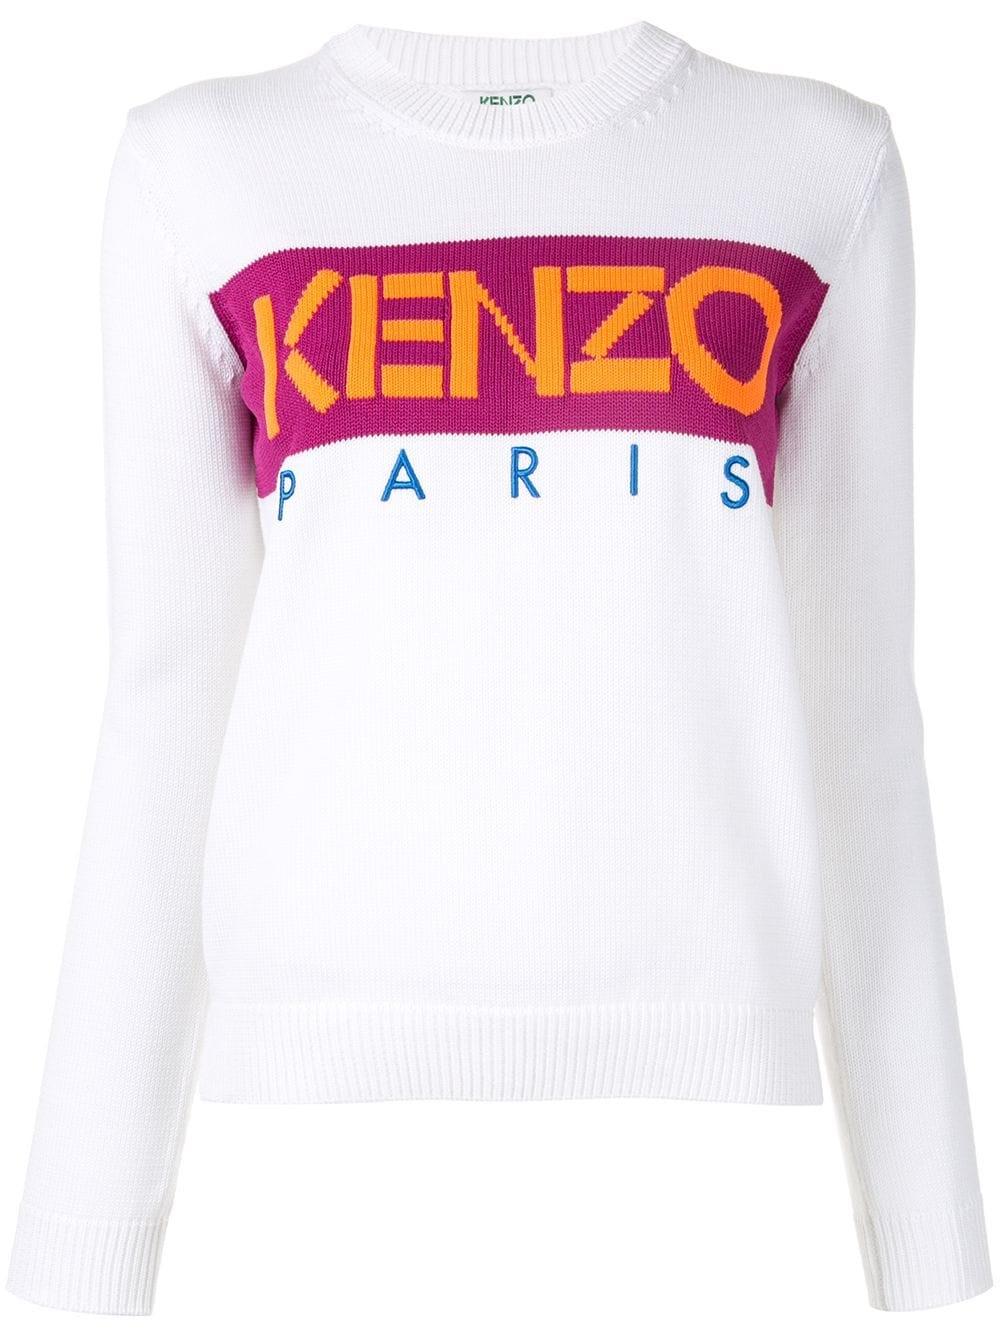 c22e1799 kenzo PARIS LOGO T-SHIRT available on montiboutique.com - 27706